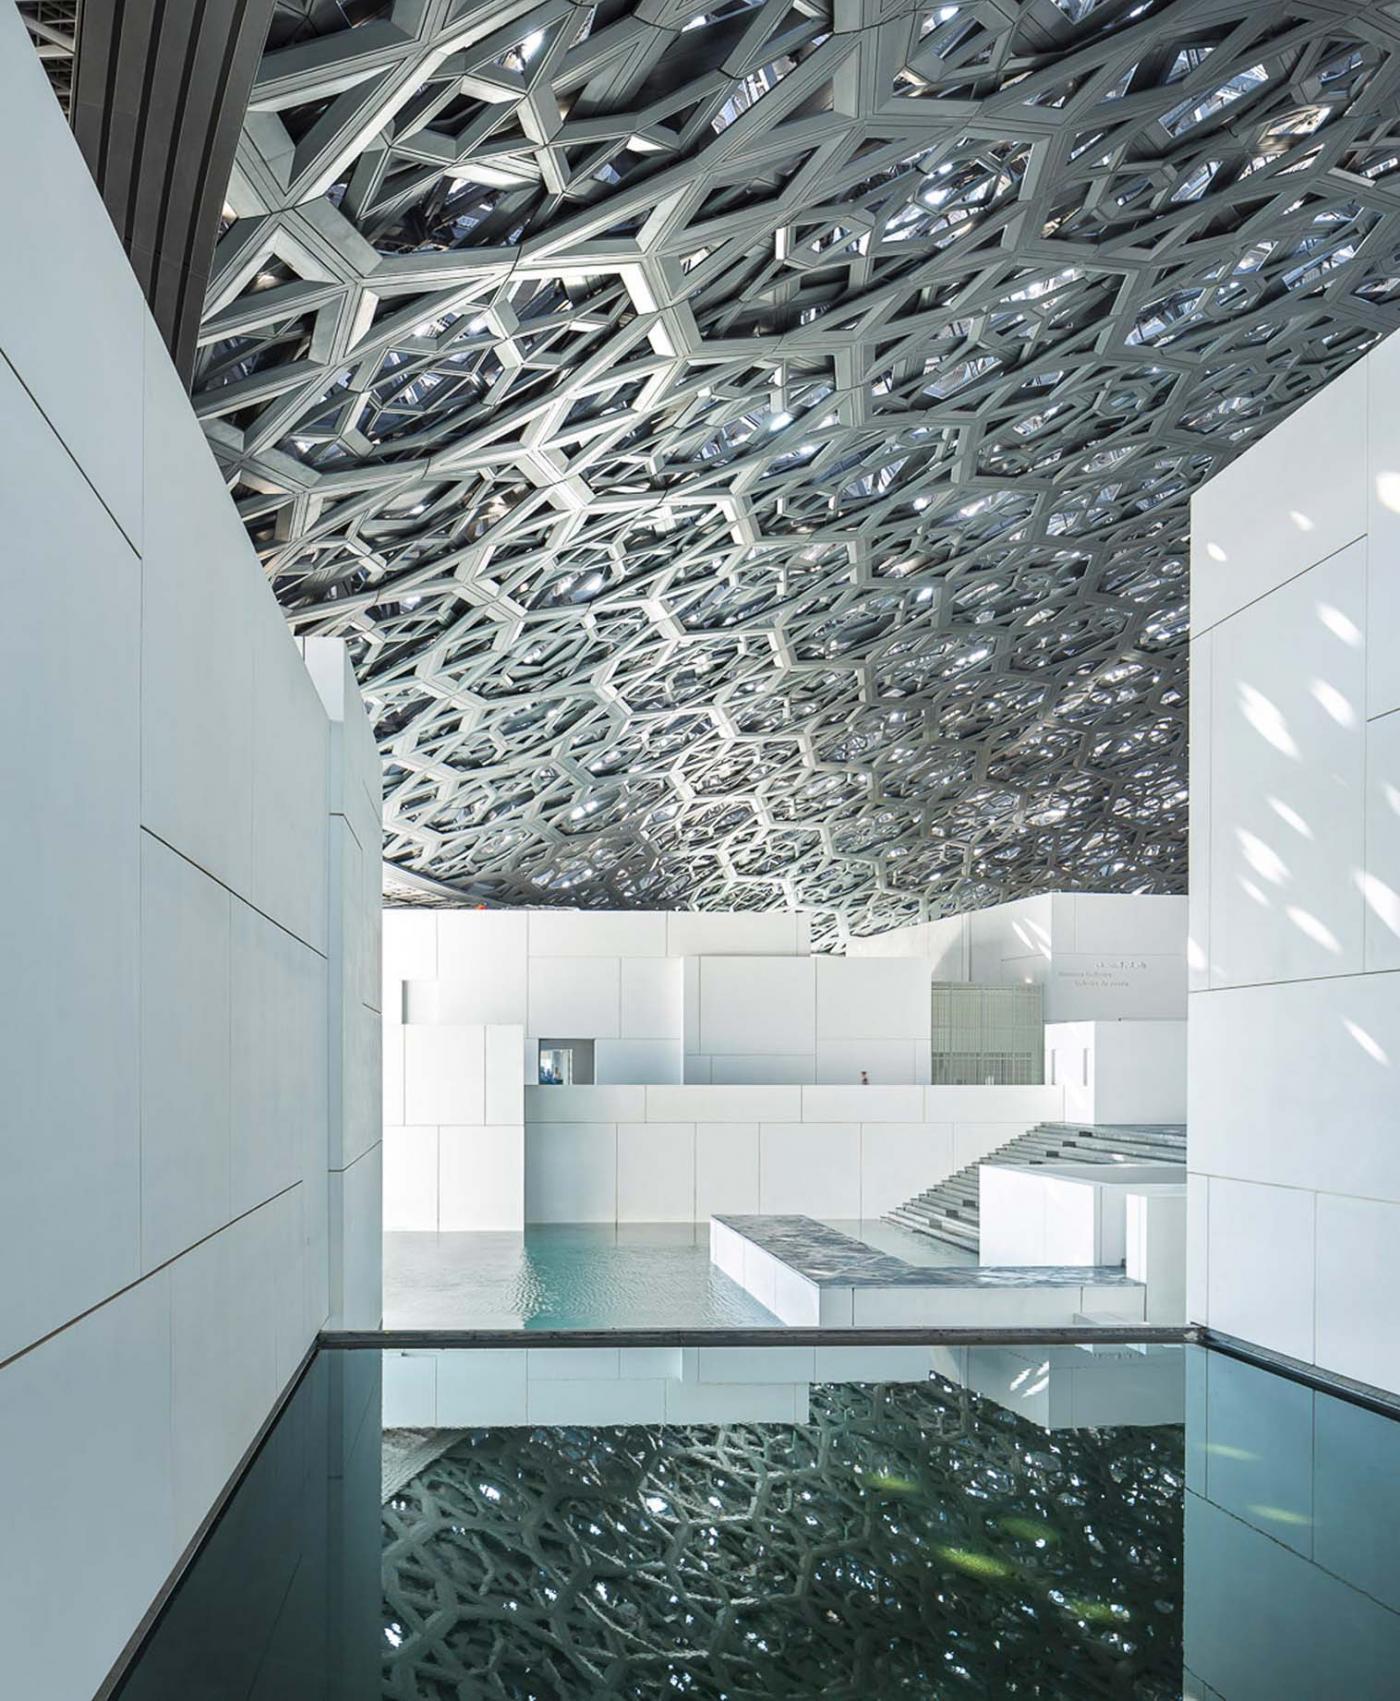 The Louvre Abu Dhabi Opens, Bringing High-Watt Art to the